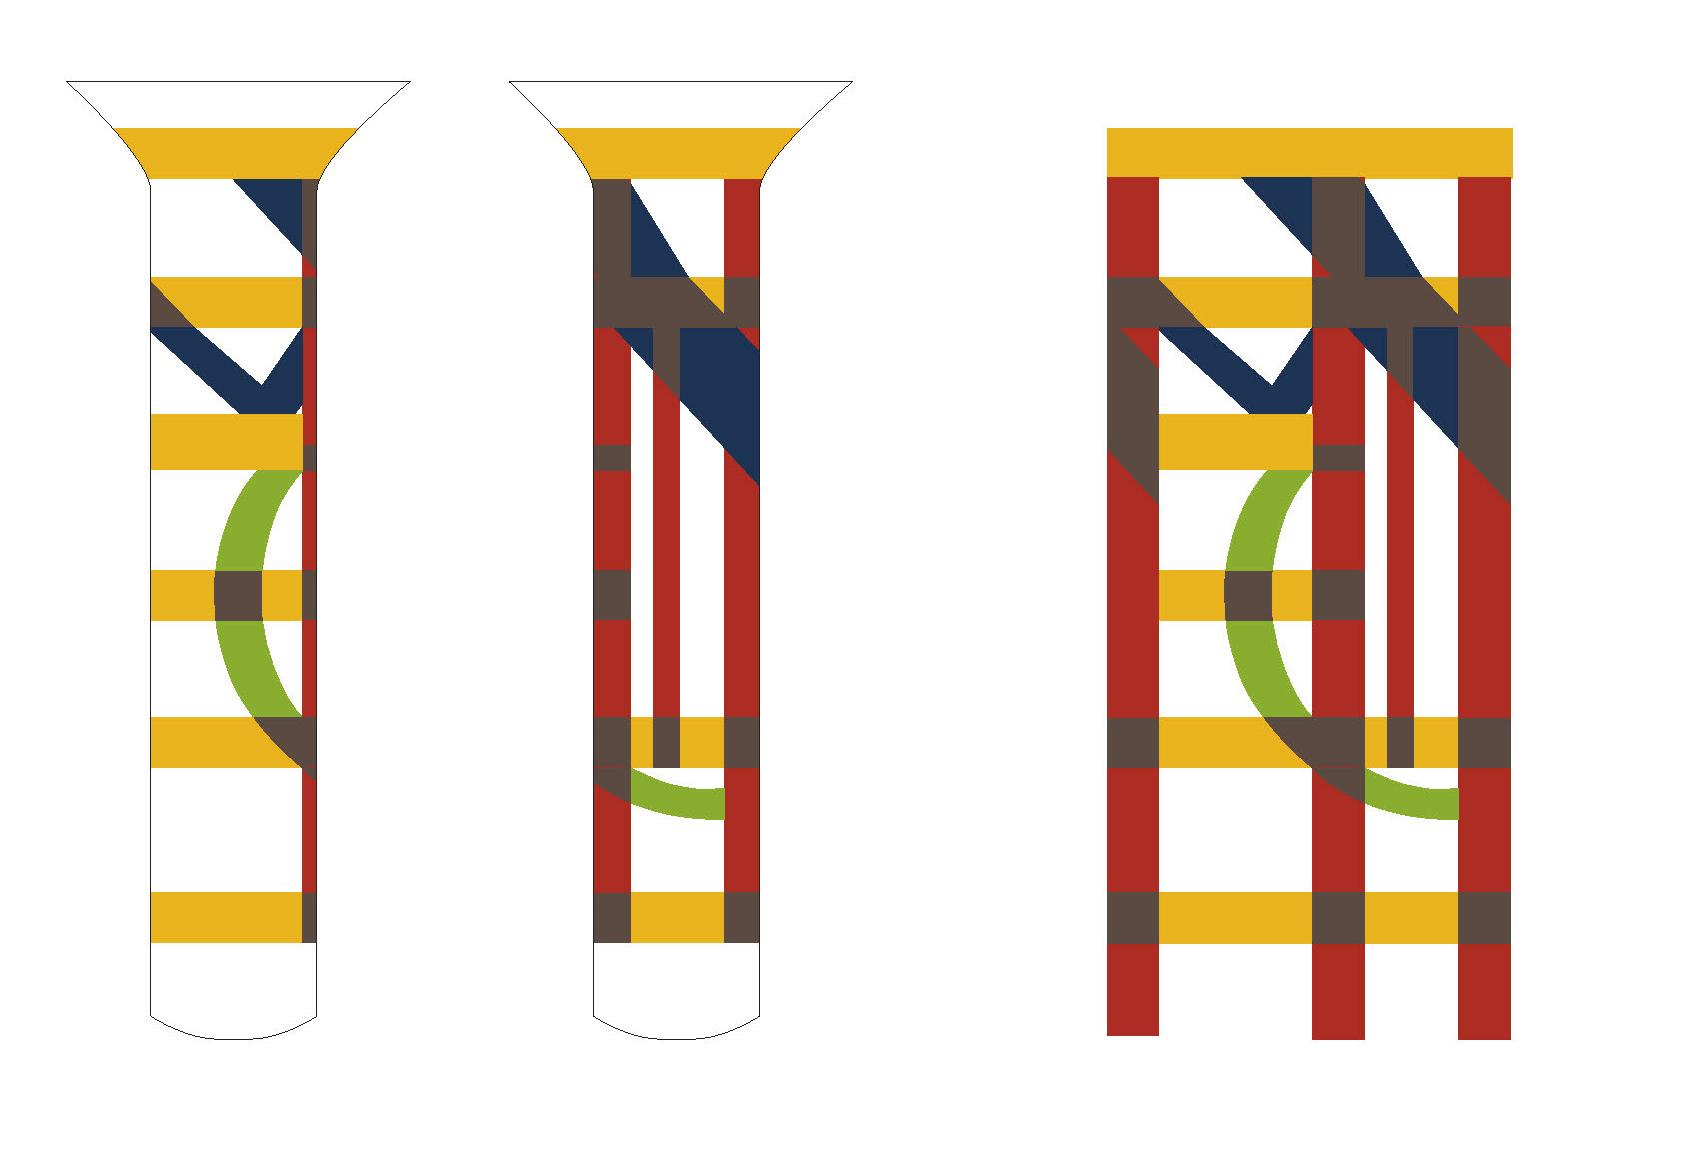 Glo columns suwbay_multi-color1.jpg